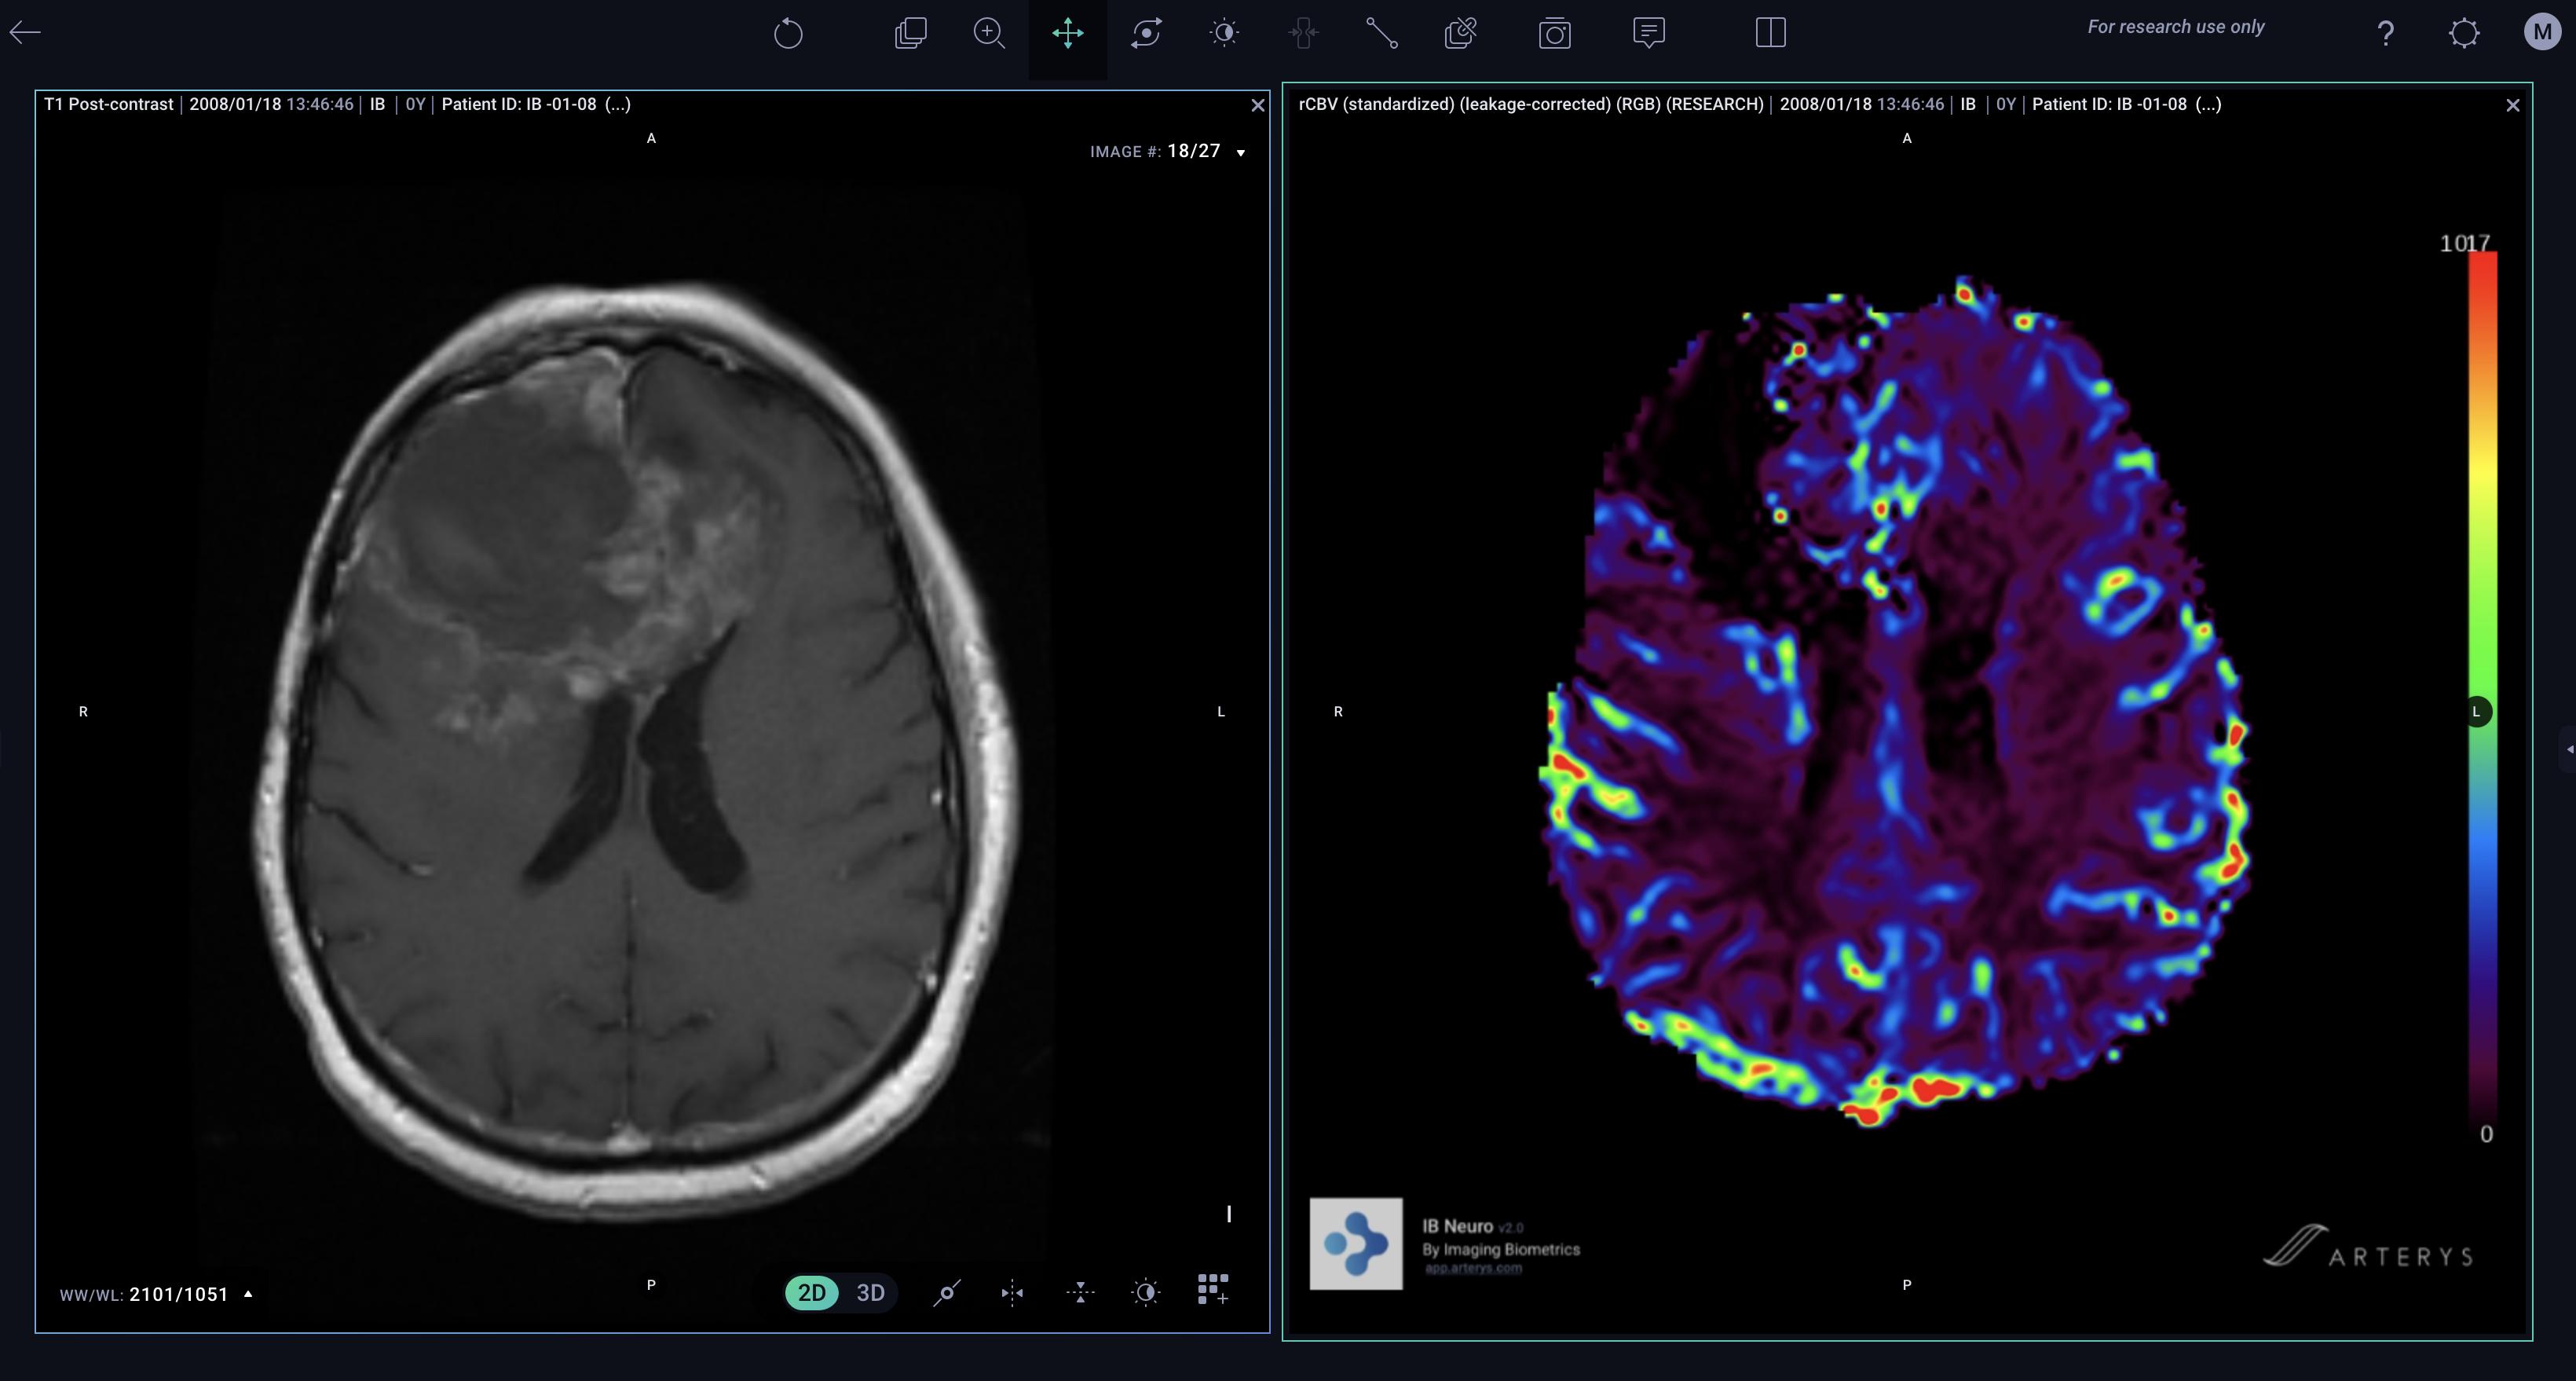 Brain tumor diagnostic on MR